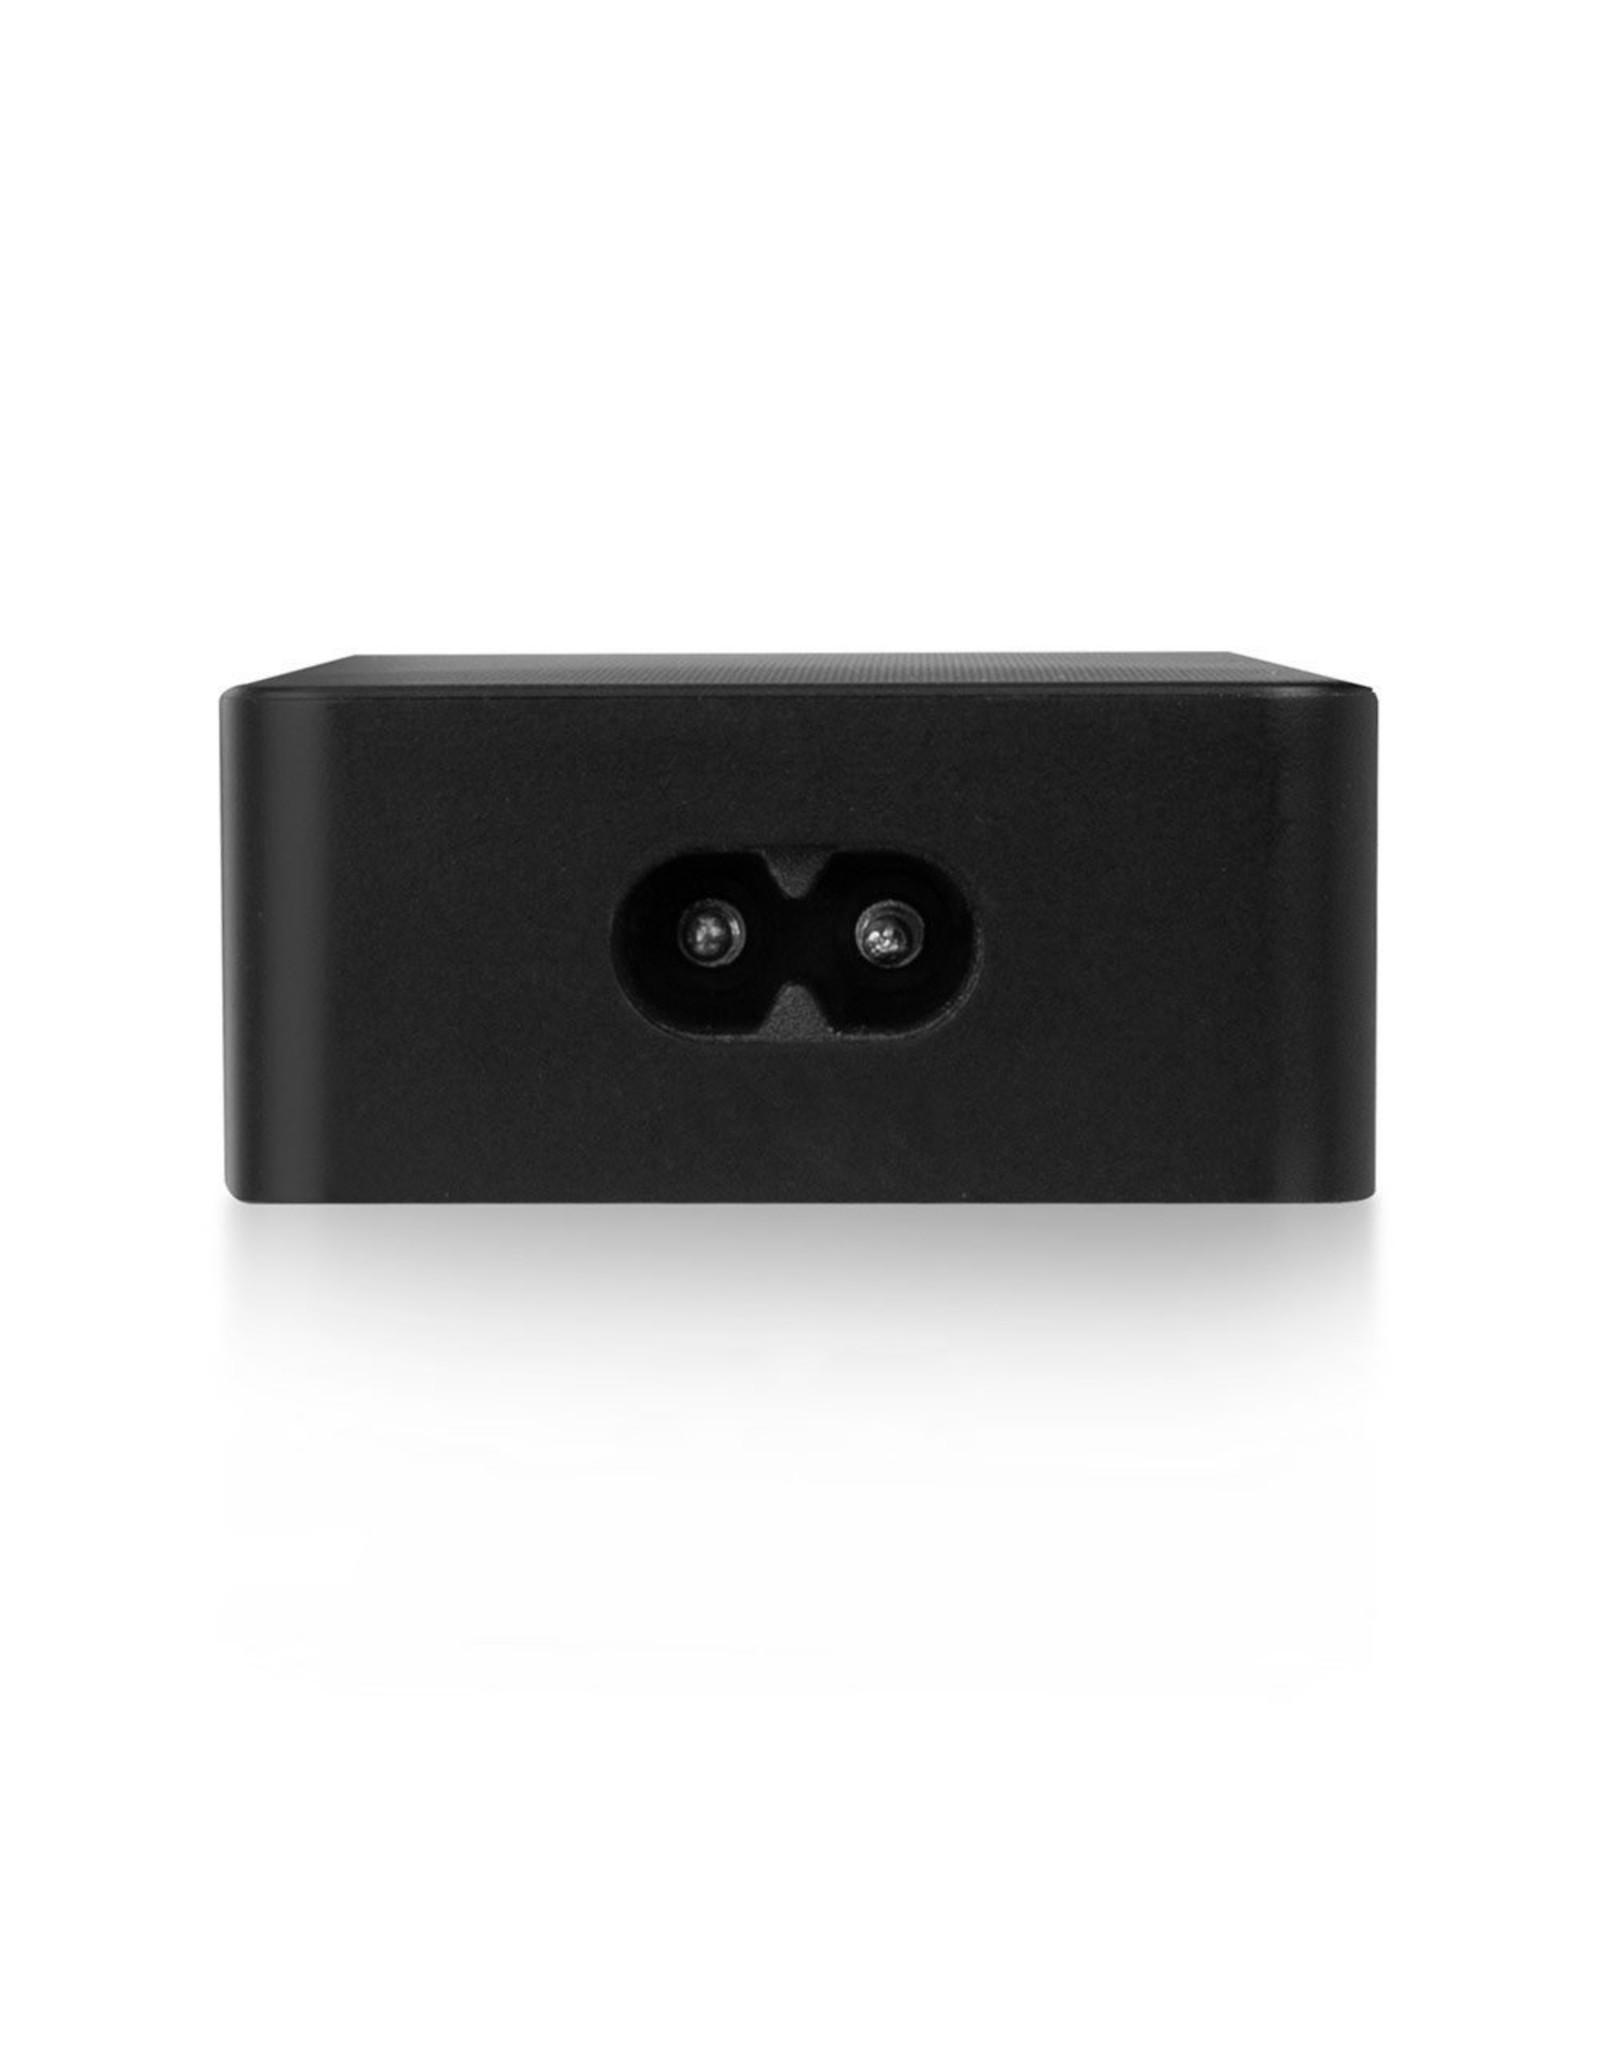 Ewent USB-C laptoplader met Power Delivery profielen 45W